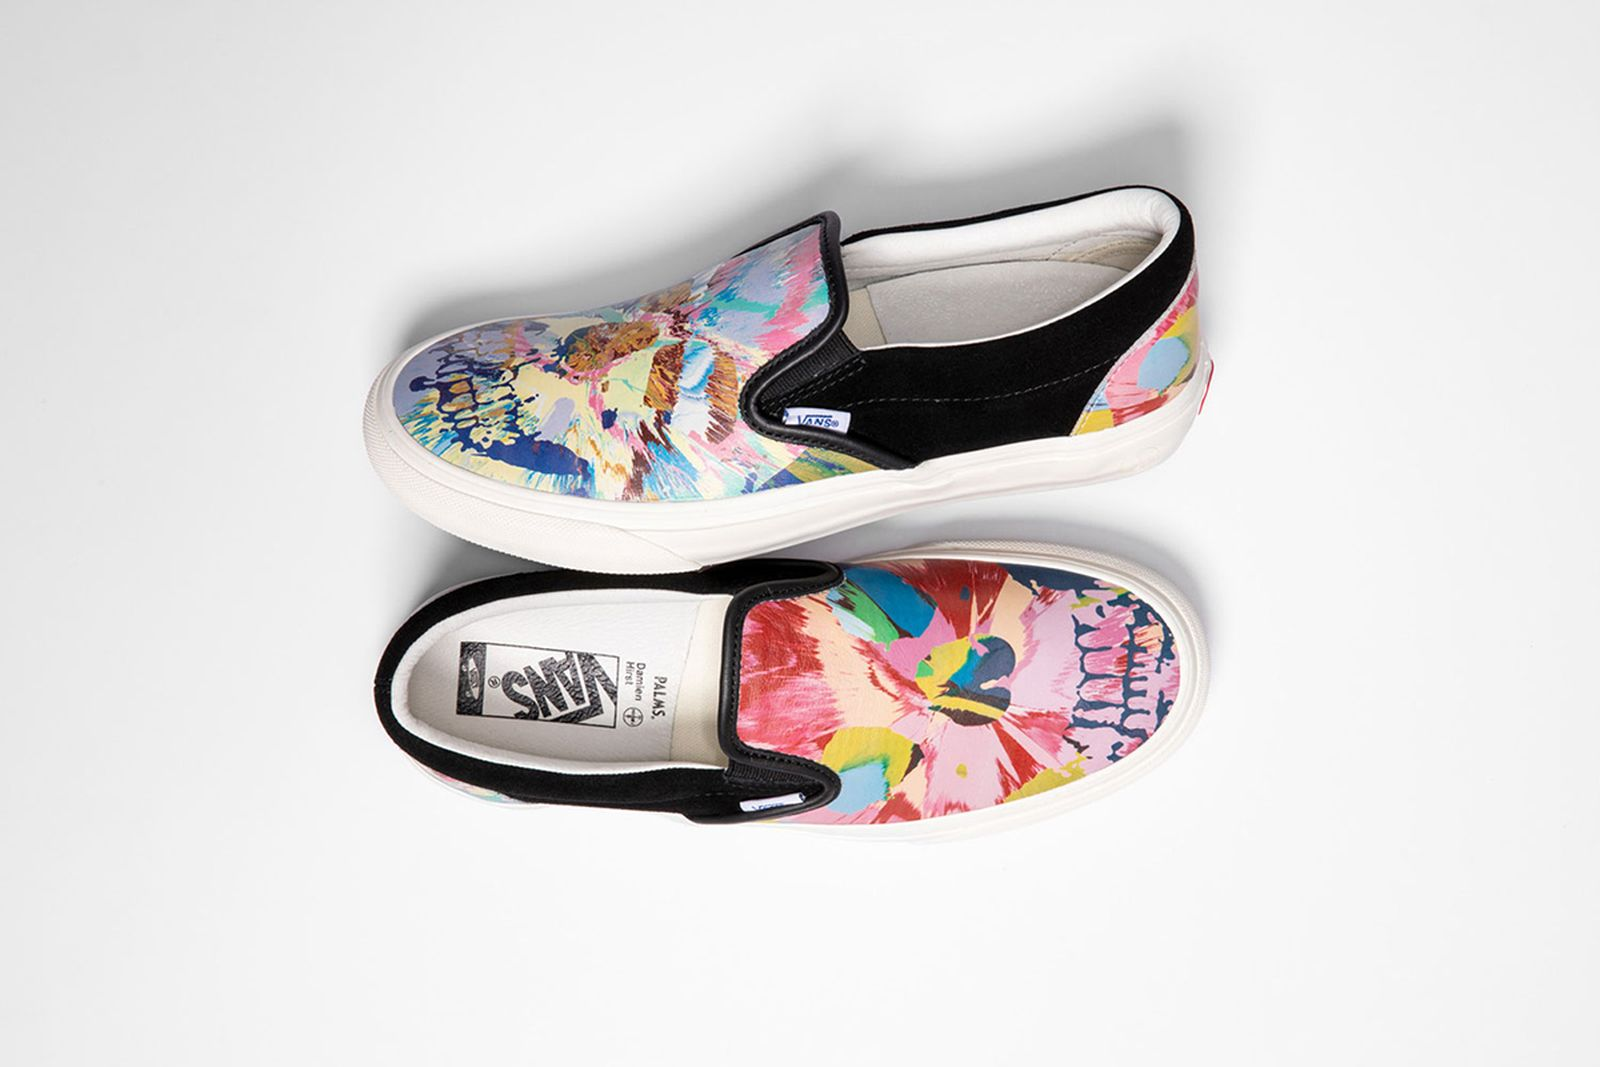 Damien Hirst x Vans Slip-On